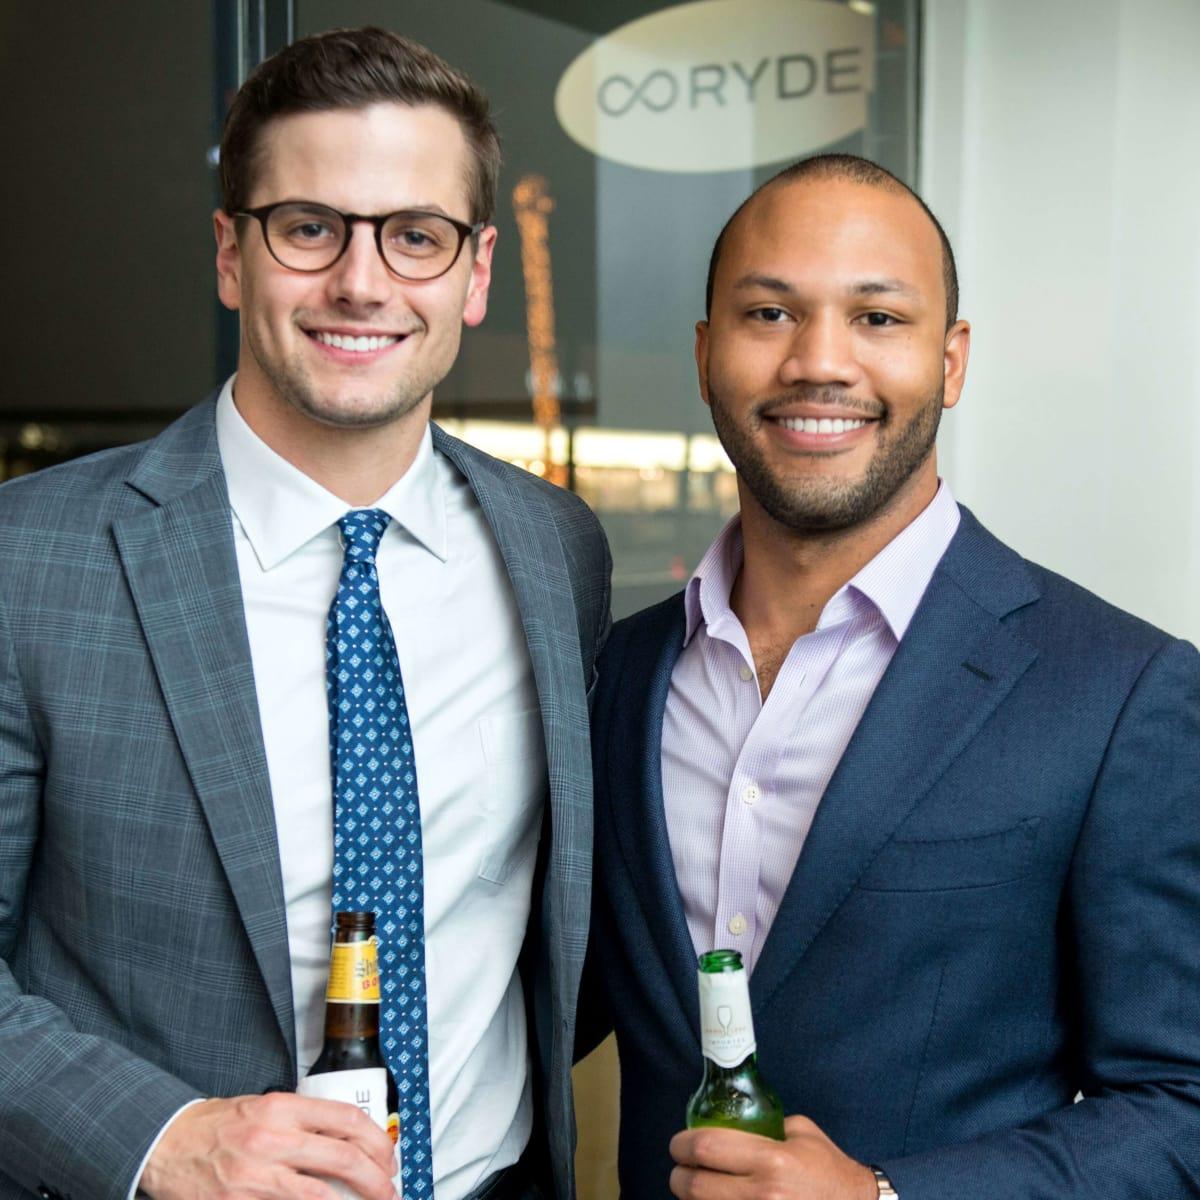 Houston, RYDE/Rose Foundation event, Oct. 2016, Aaron Charbonnet, Chris Burns